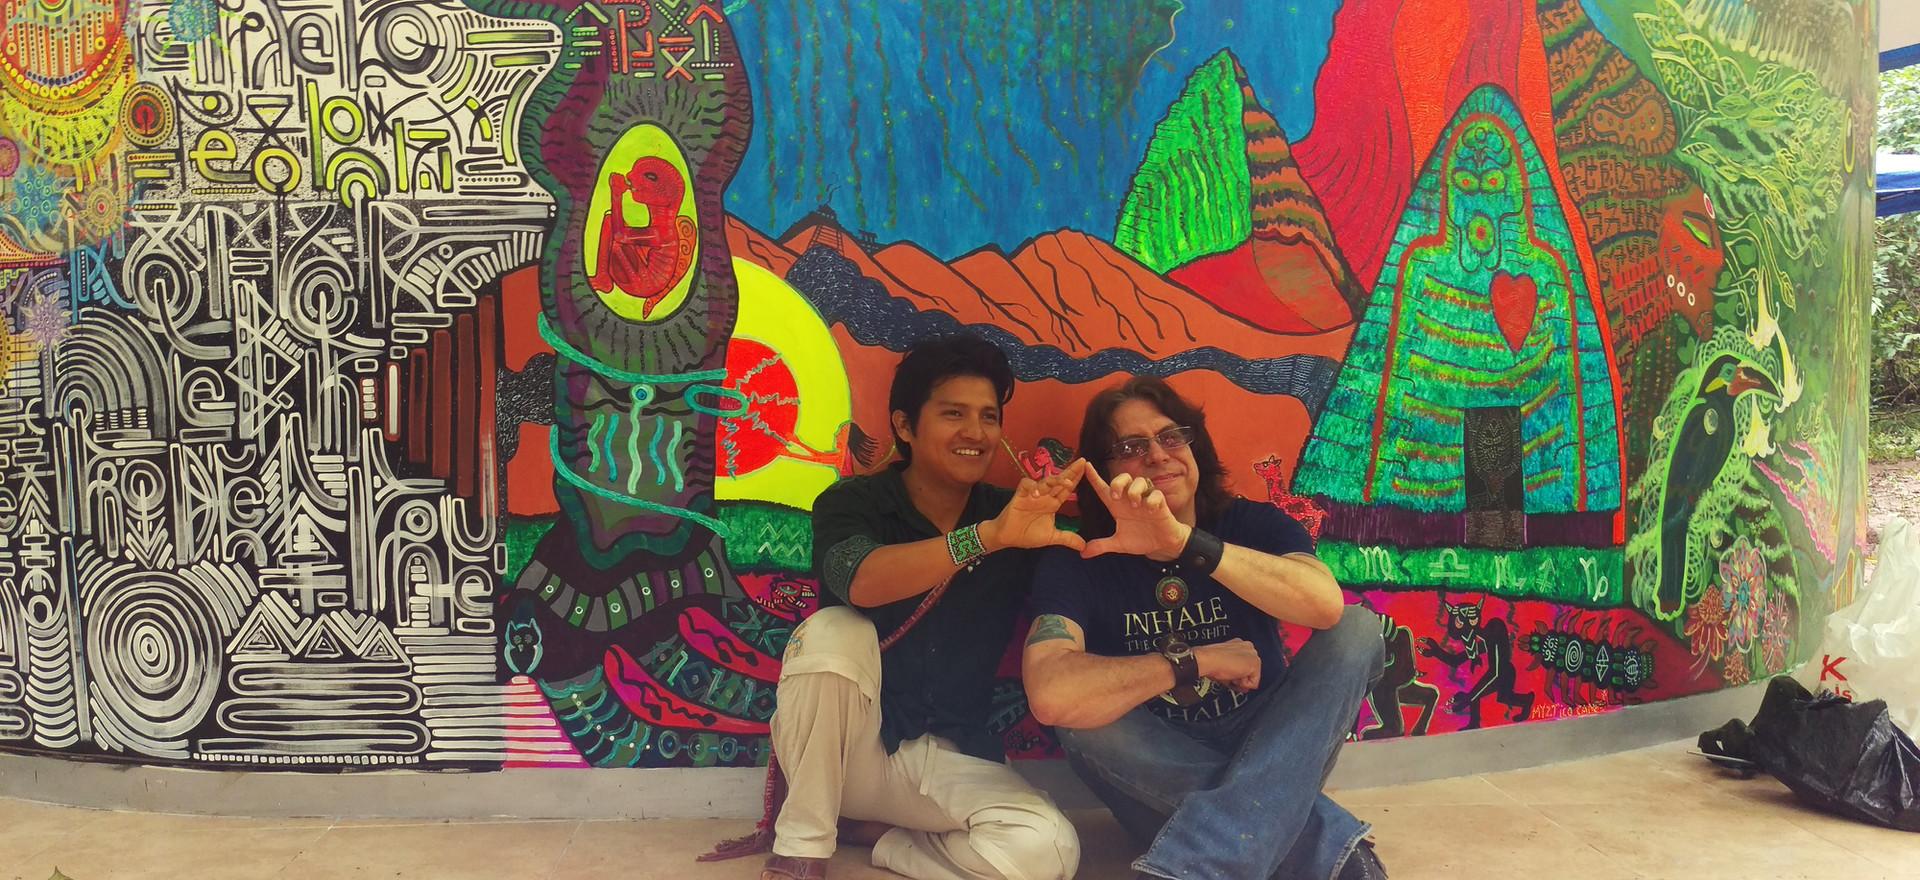 UV reactive Mural Painting at Tierra Mitica's Astronave Ayahuasca Legend Tribute in Tarapoto, Peru. With Visionary Shamanic Artist  Juan Carlos Taminchi.